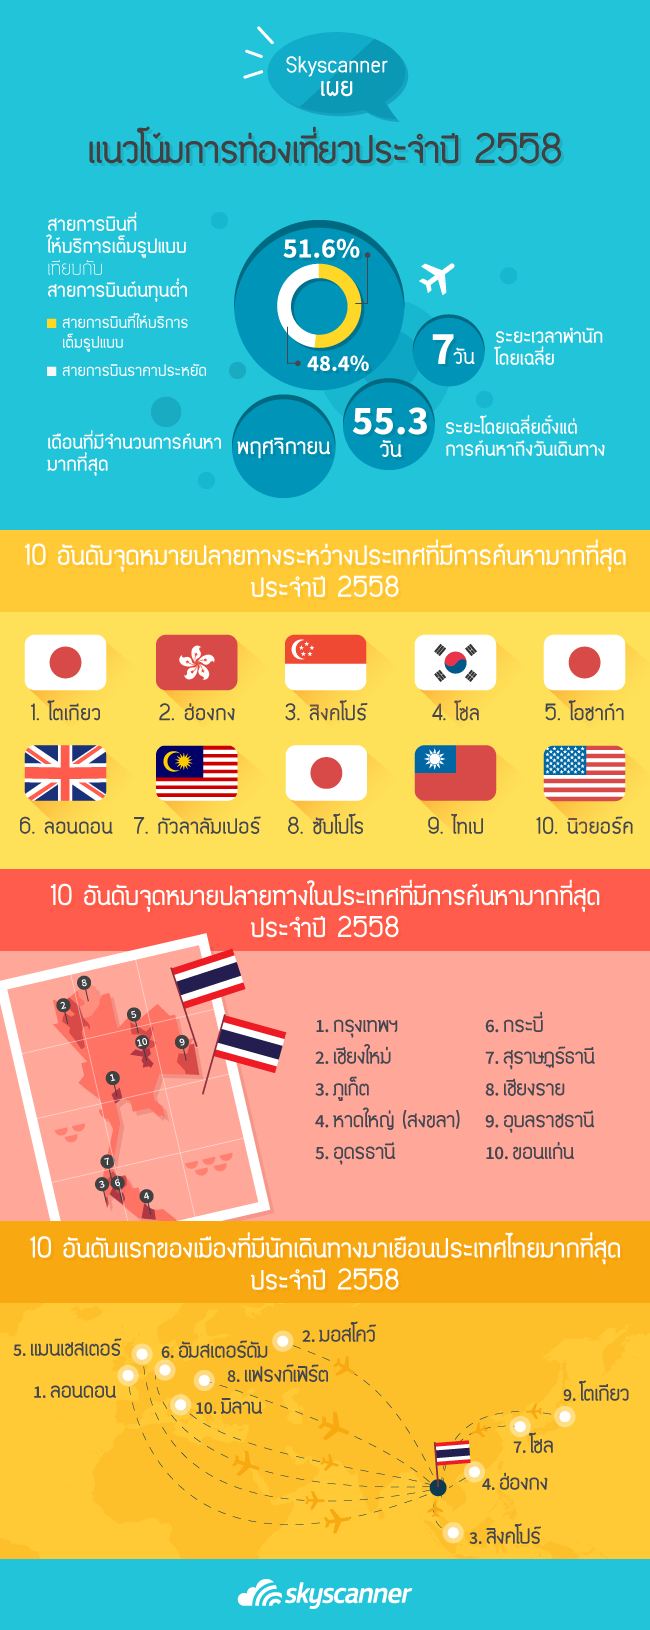 Infographic ผลสรุปการเดินทางท่องเที่ยวที่สำคัญประจำปี 2558 โดย Skyscanner